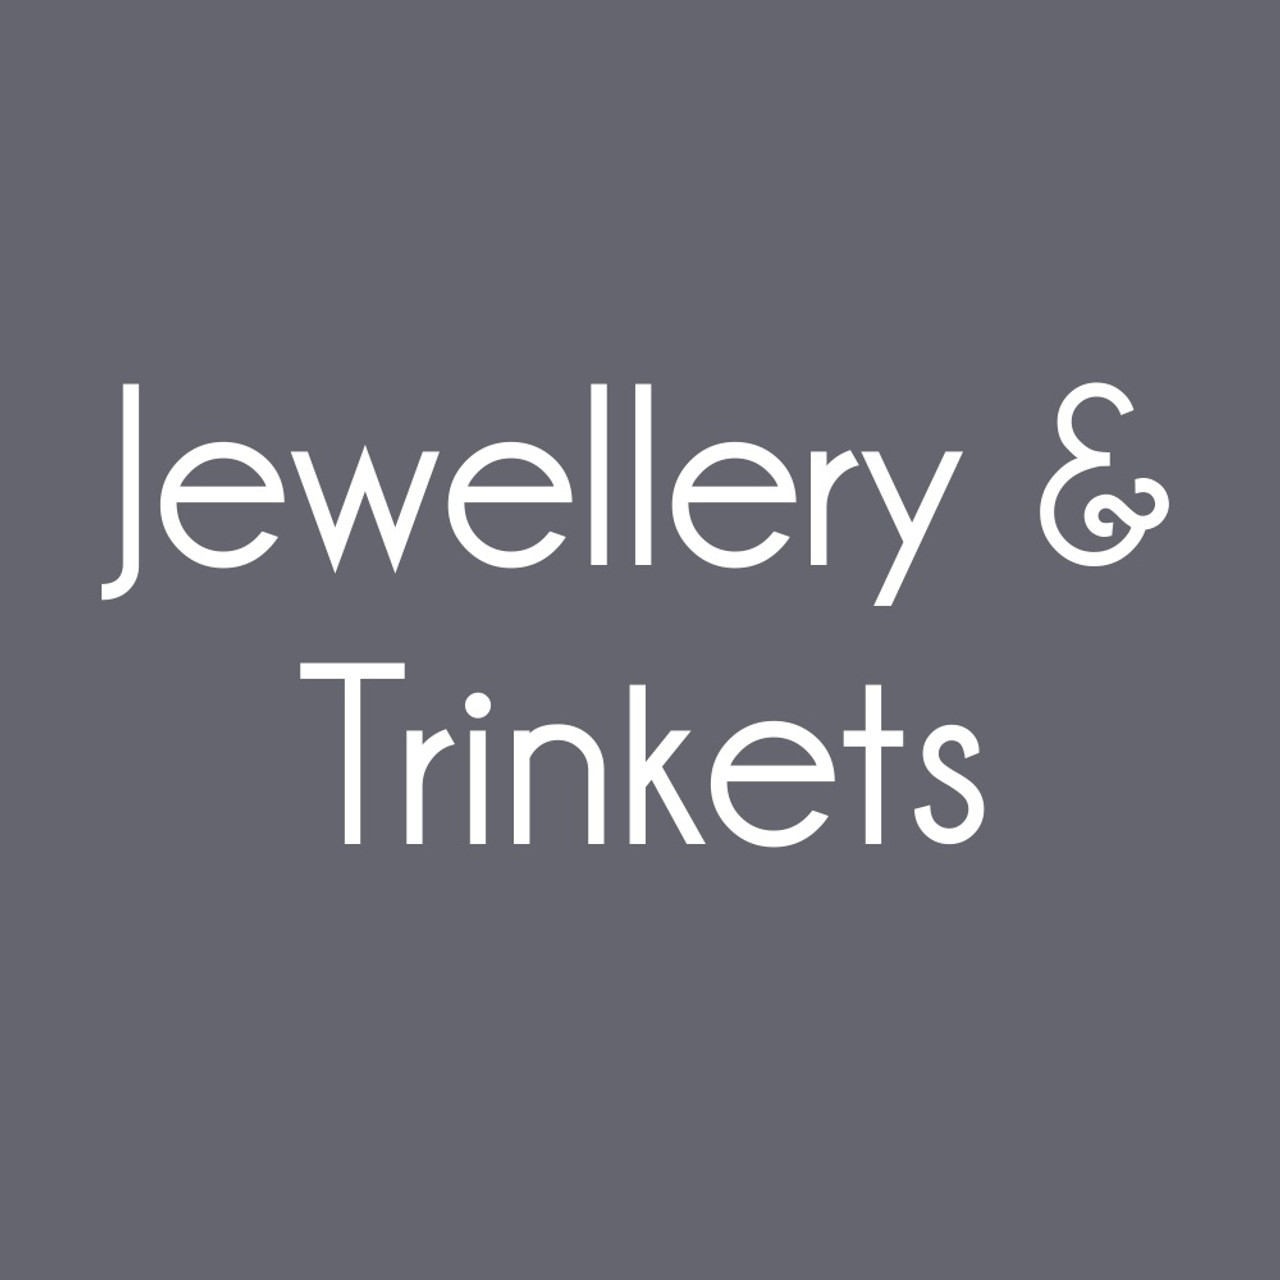 Jewellery & Trinkets